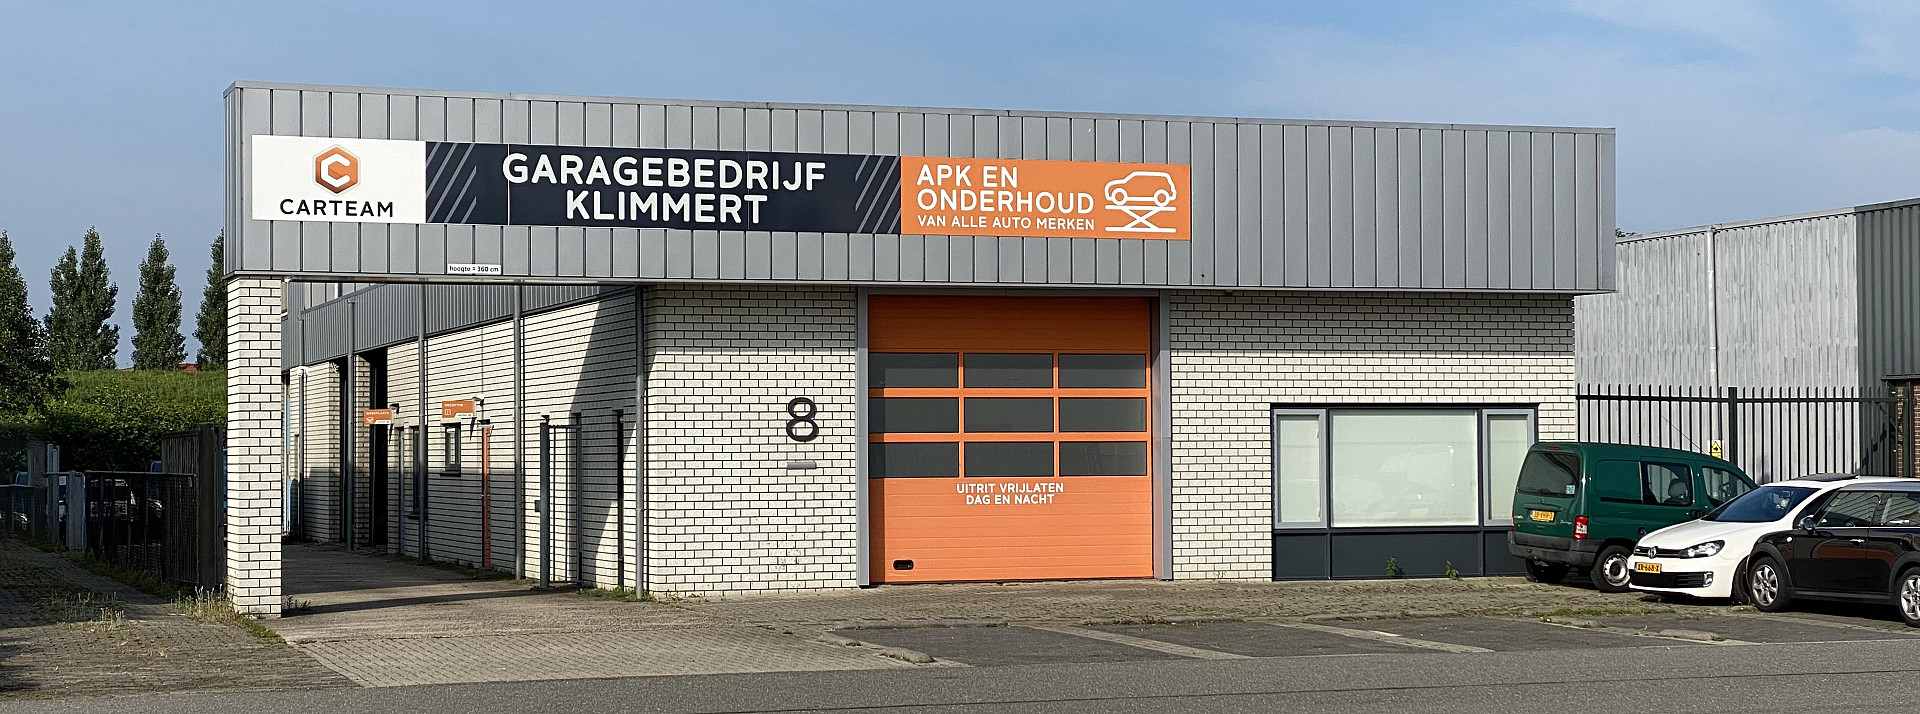 Carteam Garagebedrijf Klimmert